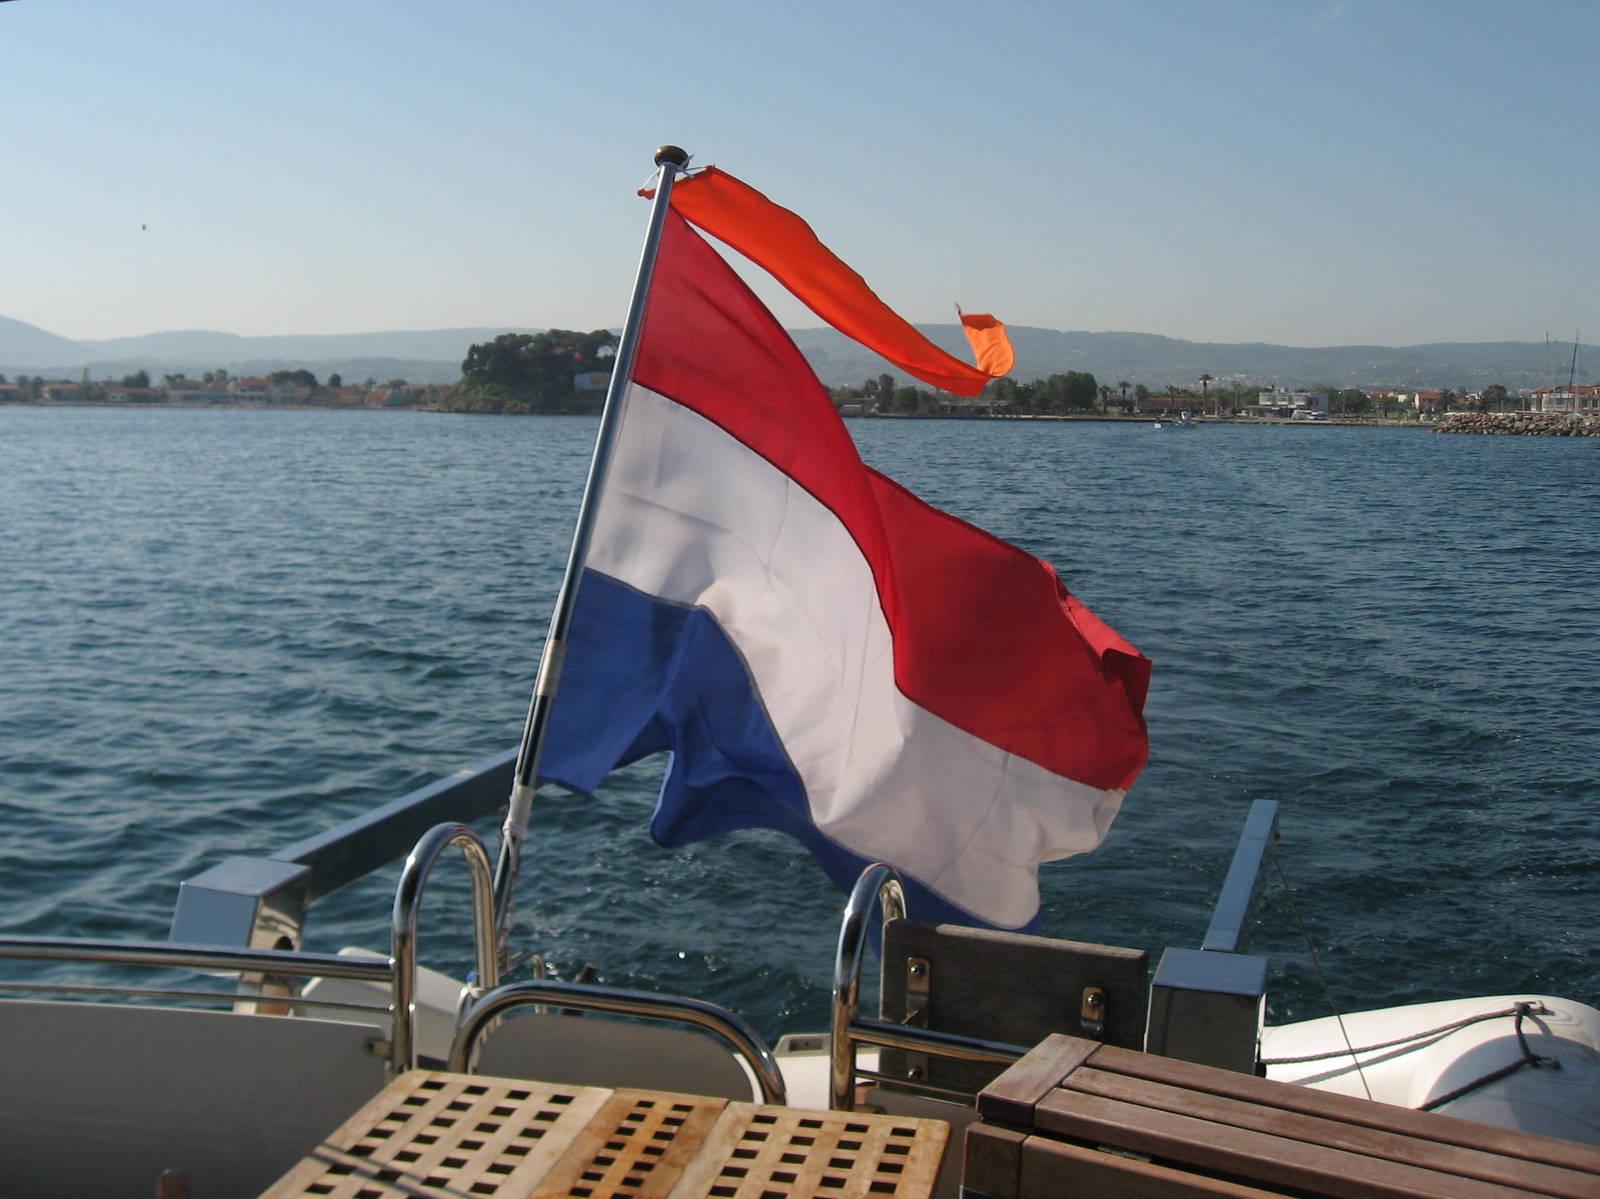 https://smelne.nl/wp-content/uploads/2013/05/Vlag-met-oranje-wimpel.jpg